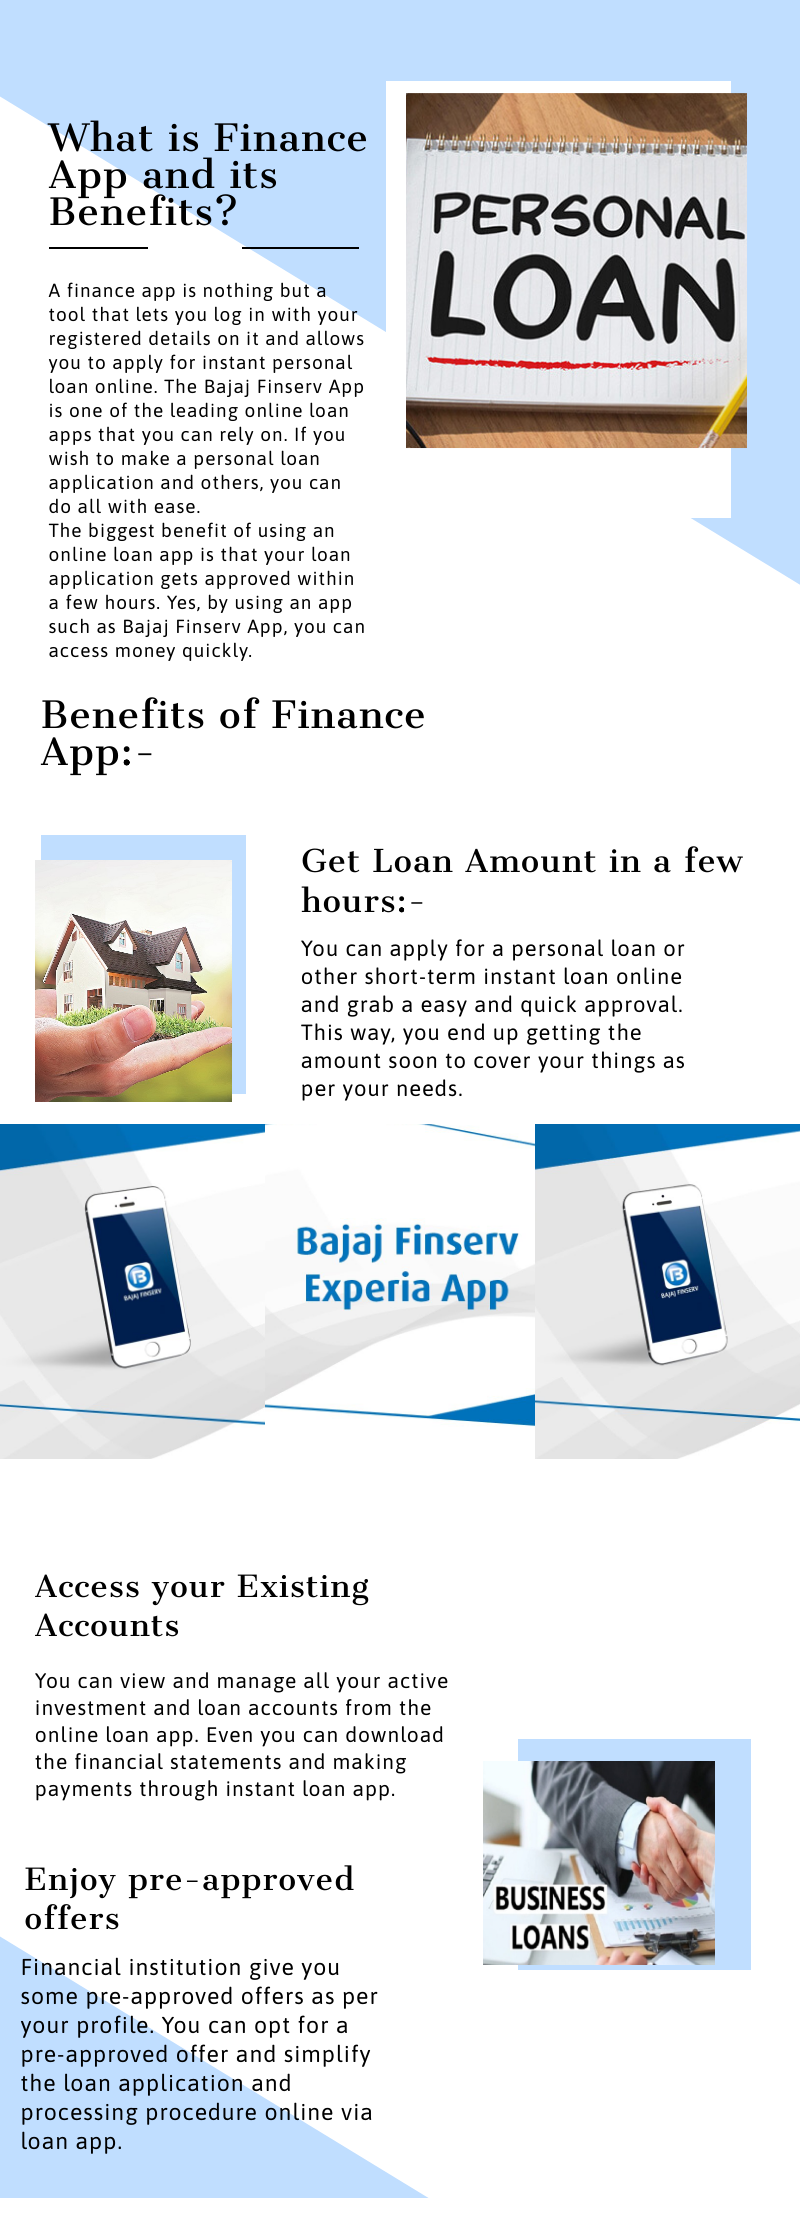 Get To Know About Finance App In 2020 Finance App Online Loans App